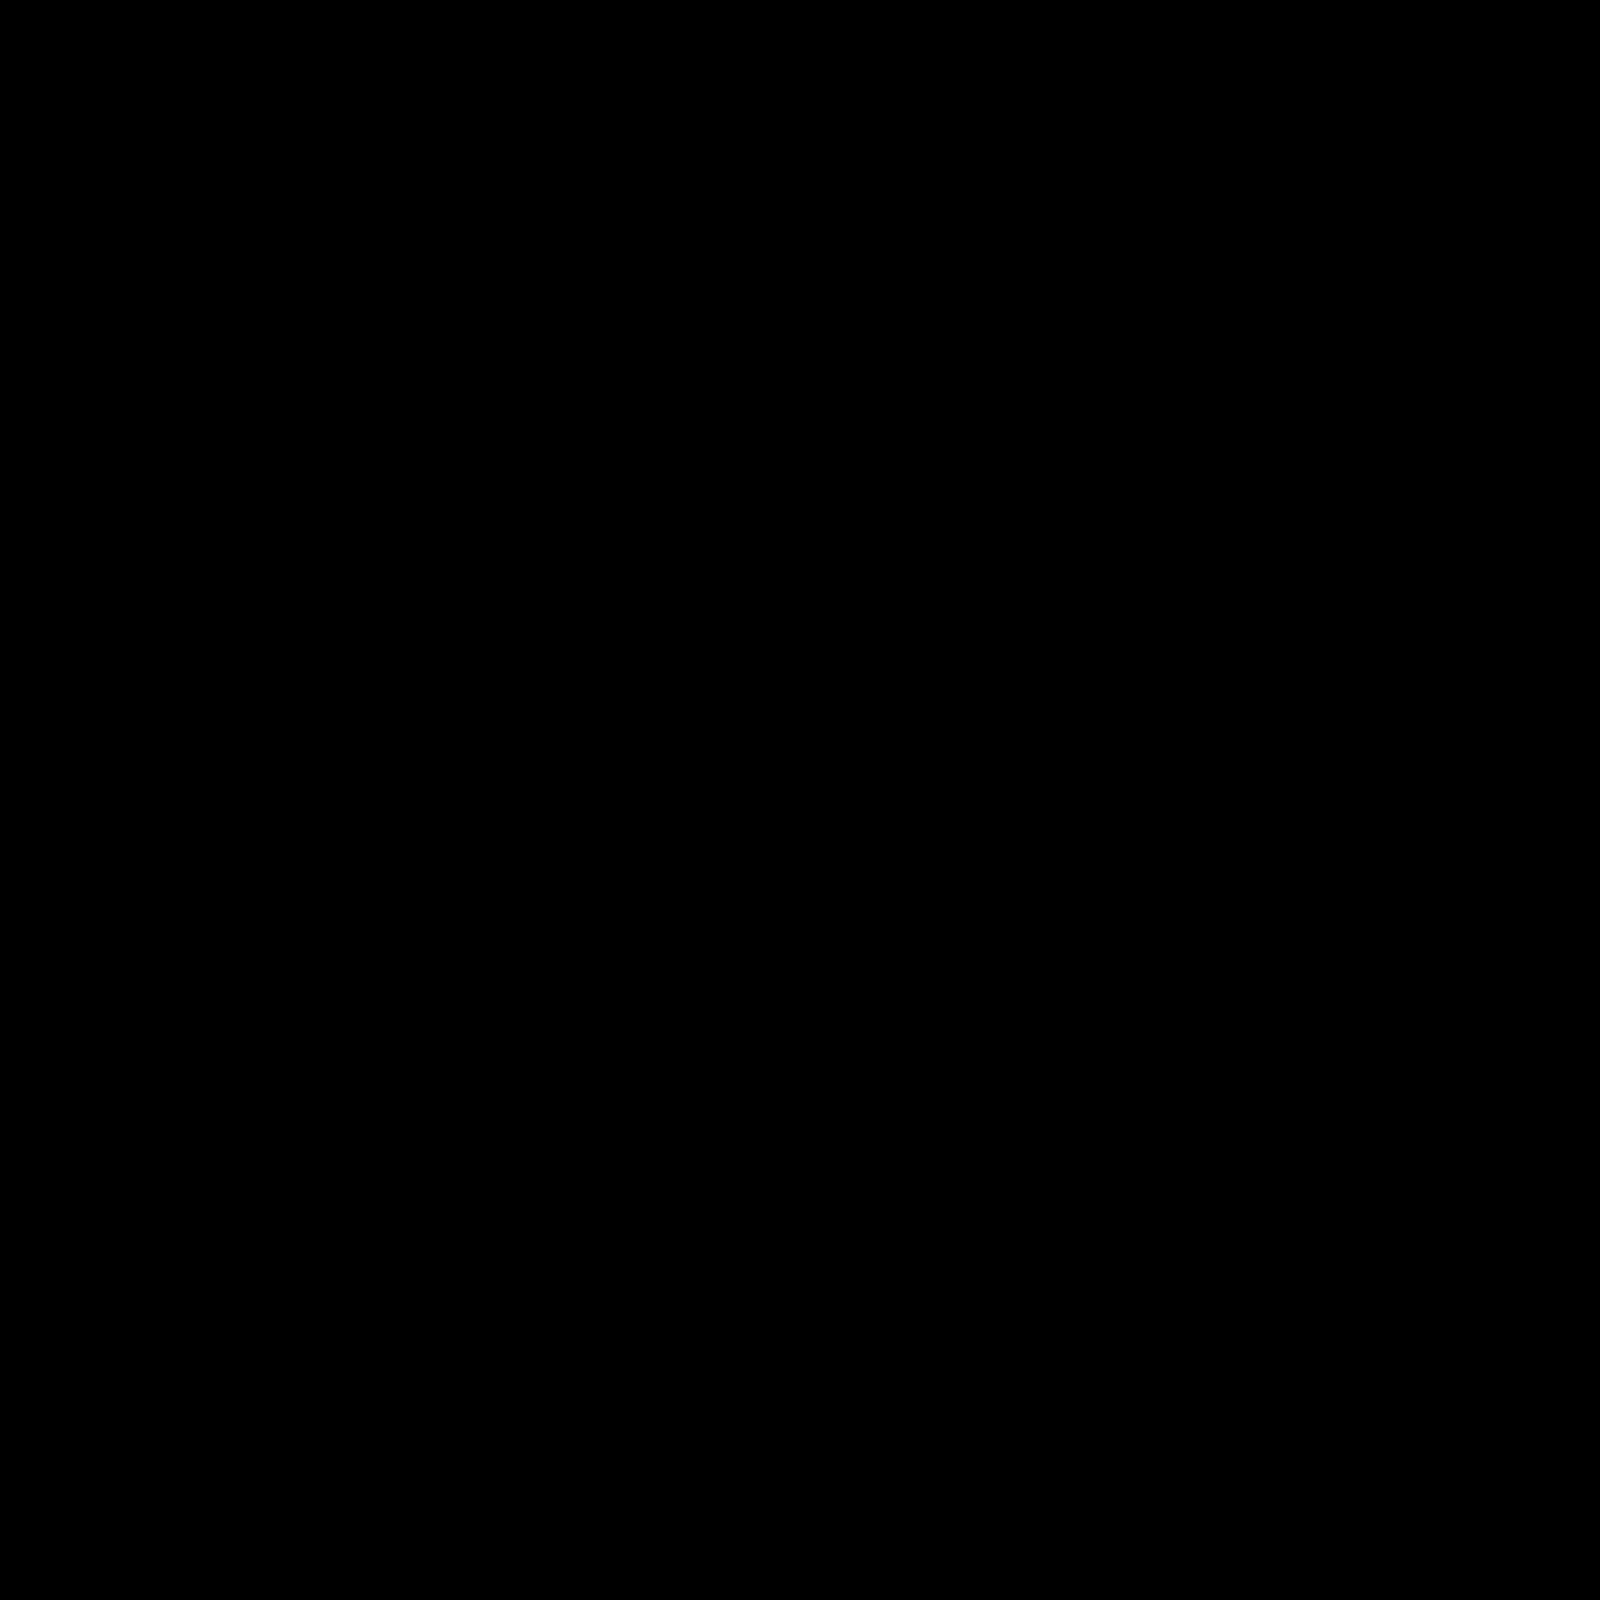 Add Font icon